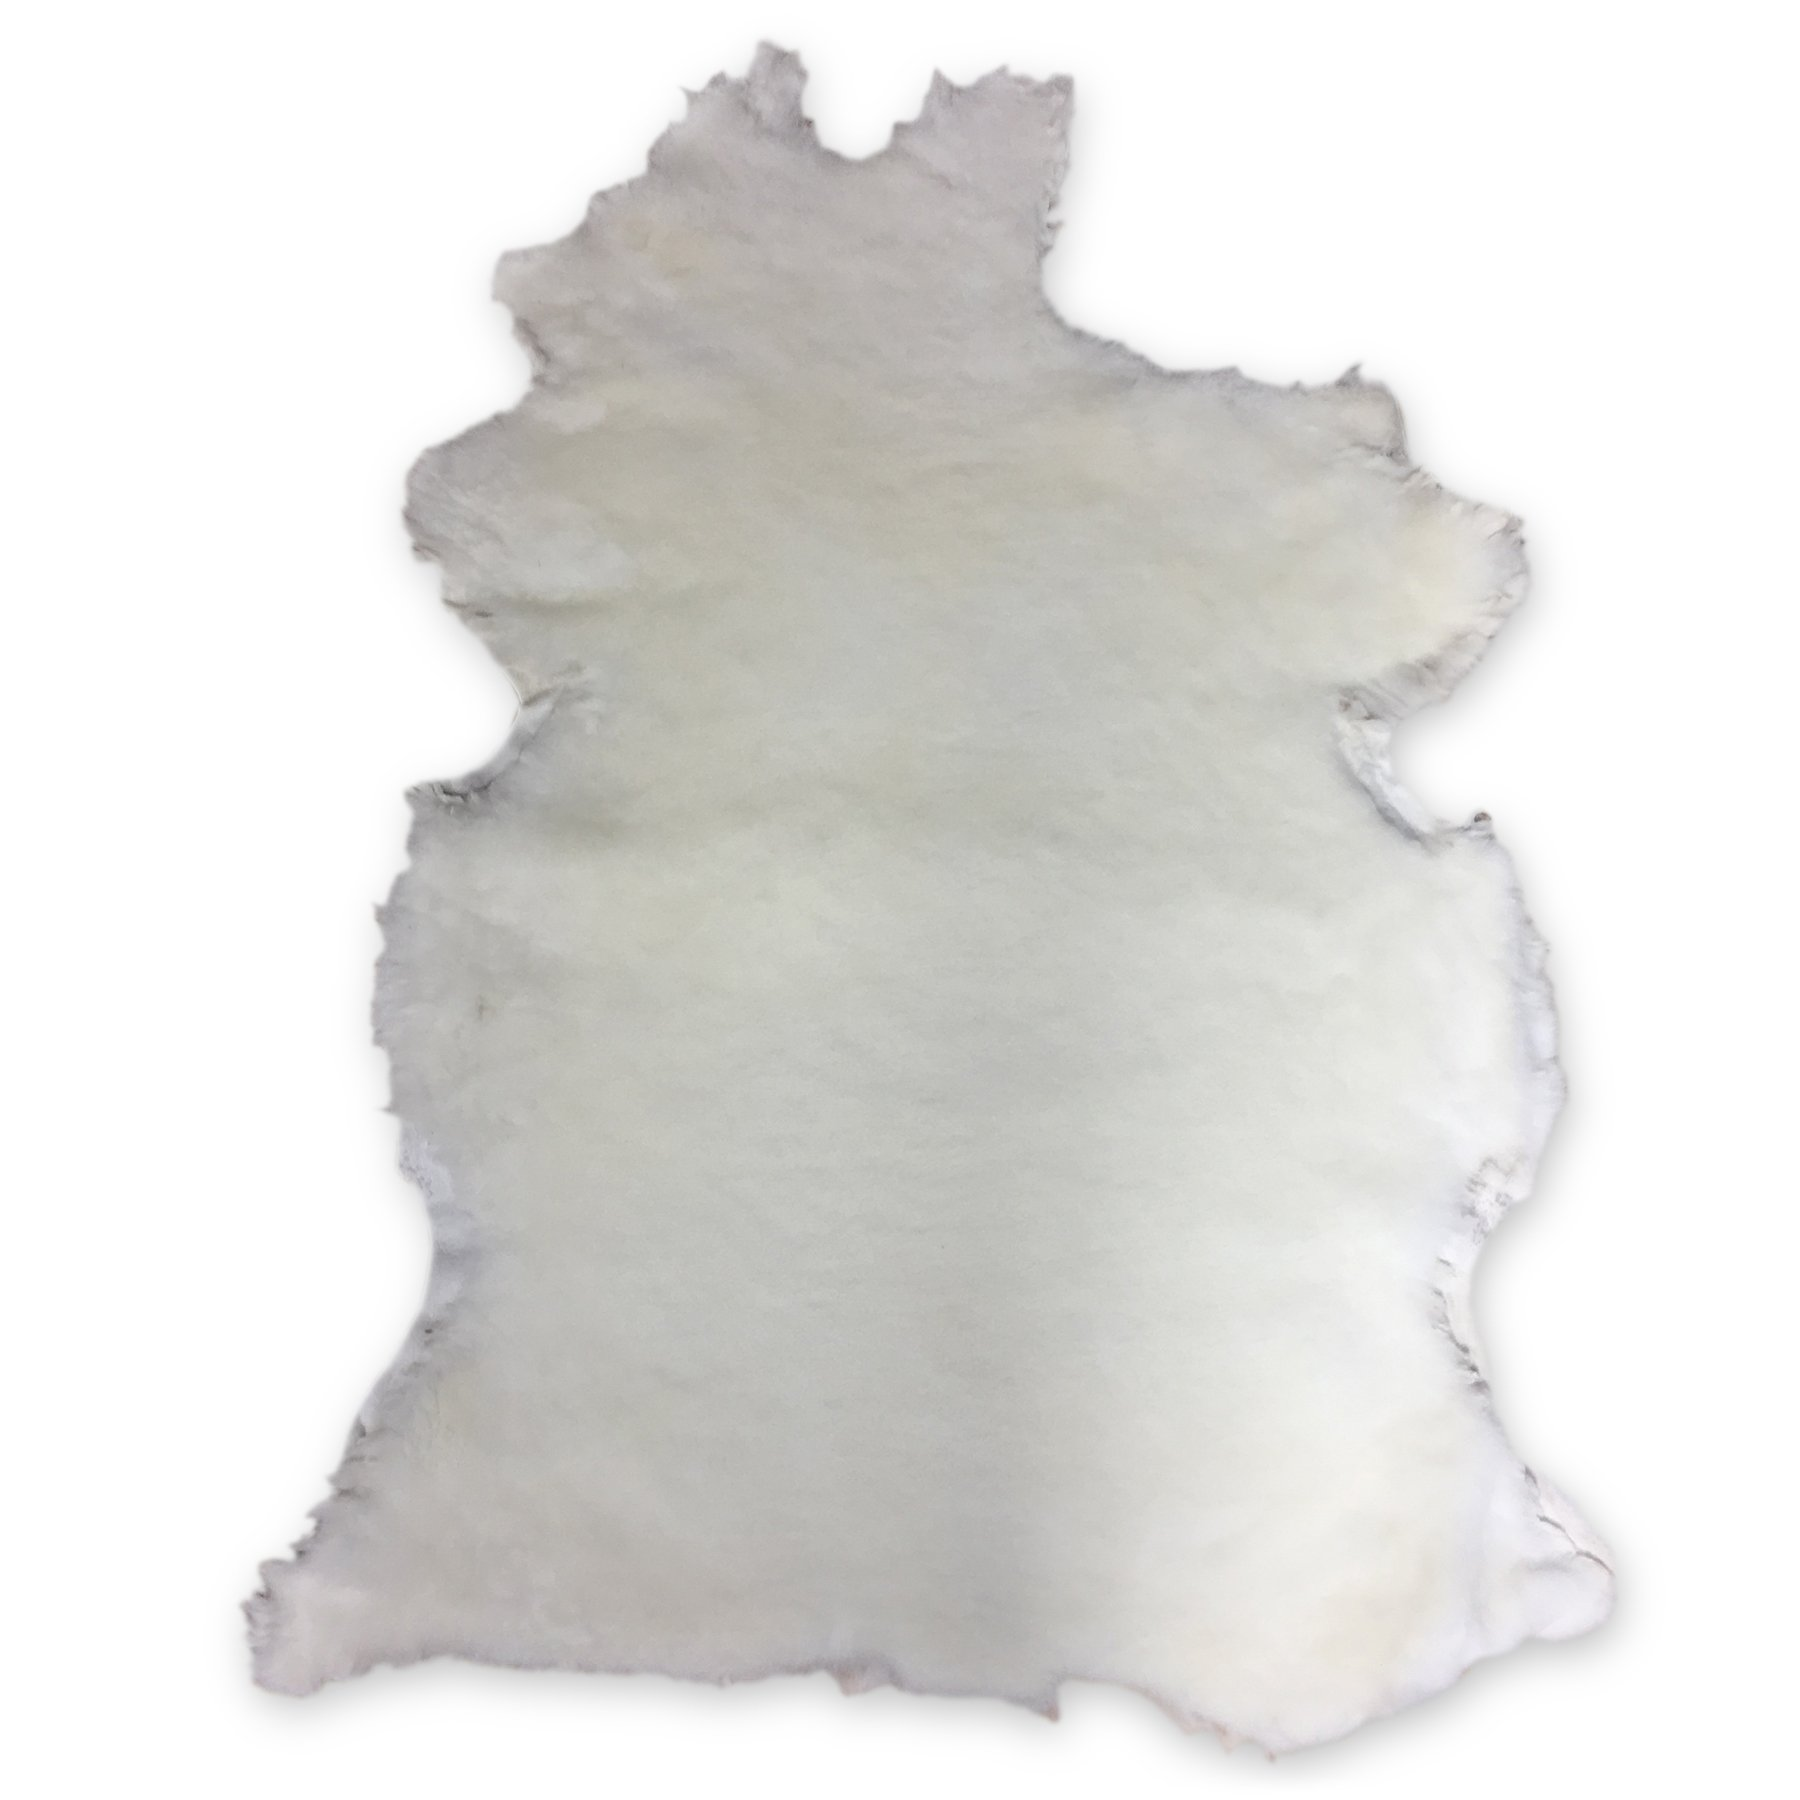 Natural White Shearling Leather Sheepskin Hides Fur Skin Hair On AVG 8.75 Sqft (12mm)